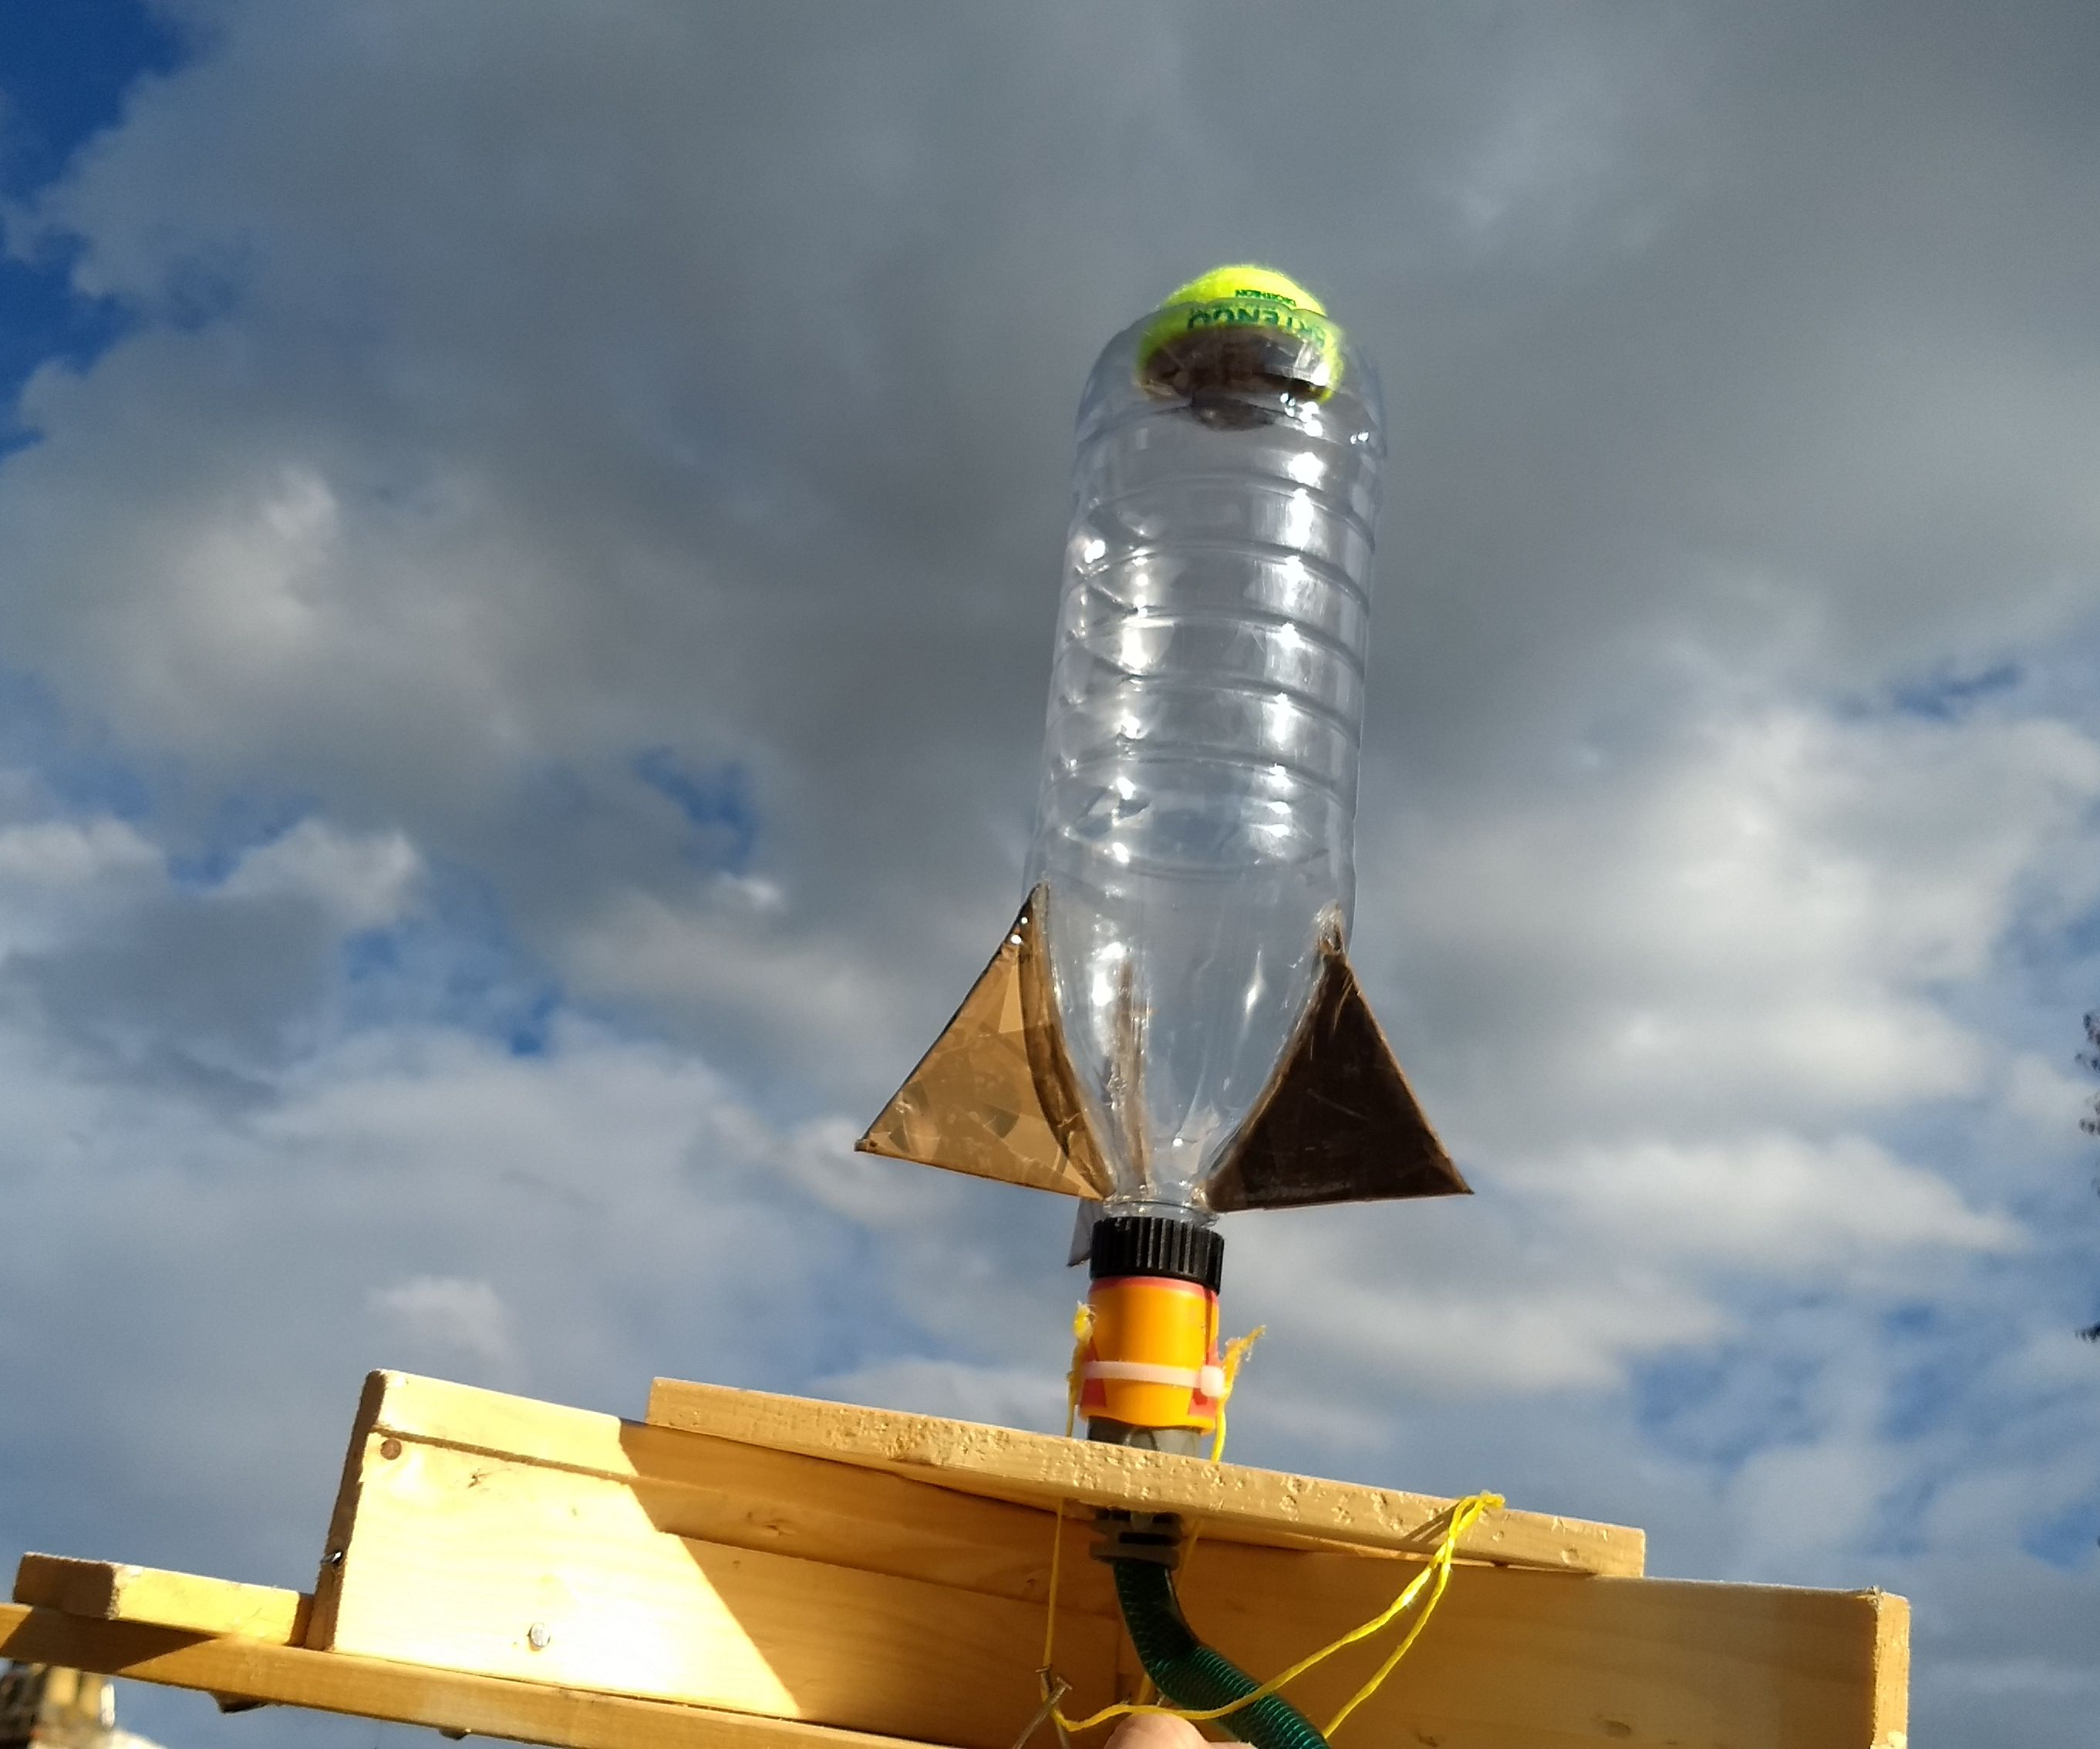 Simplified Water Rocket